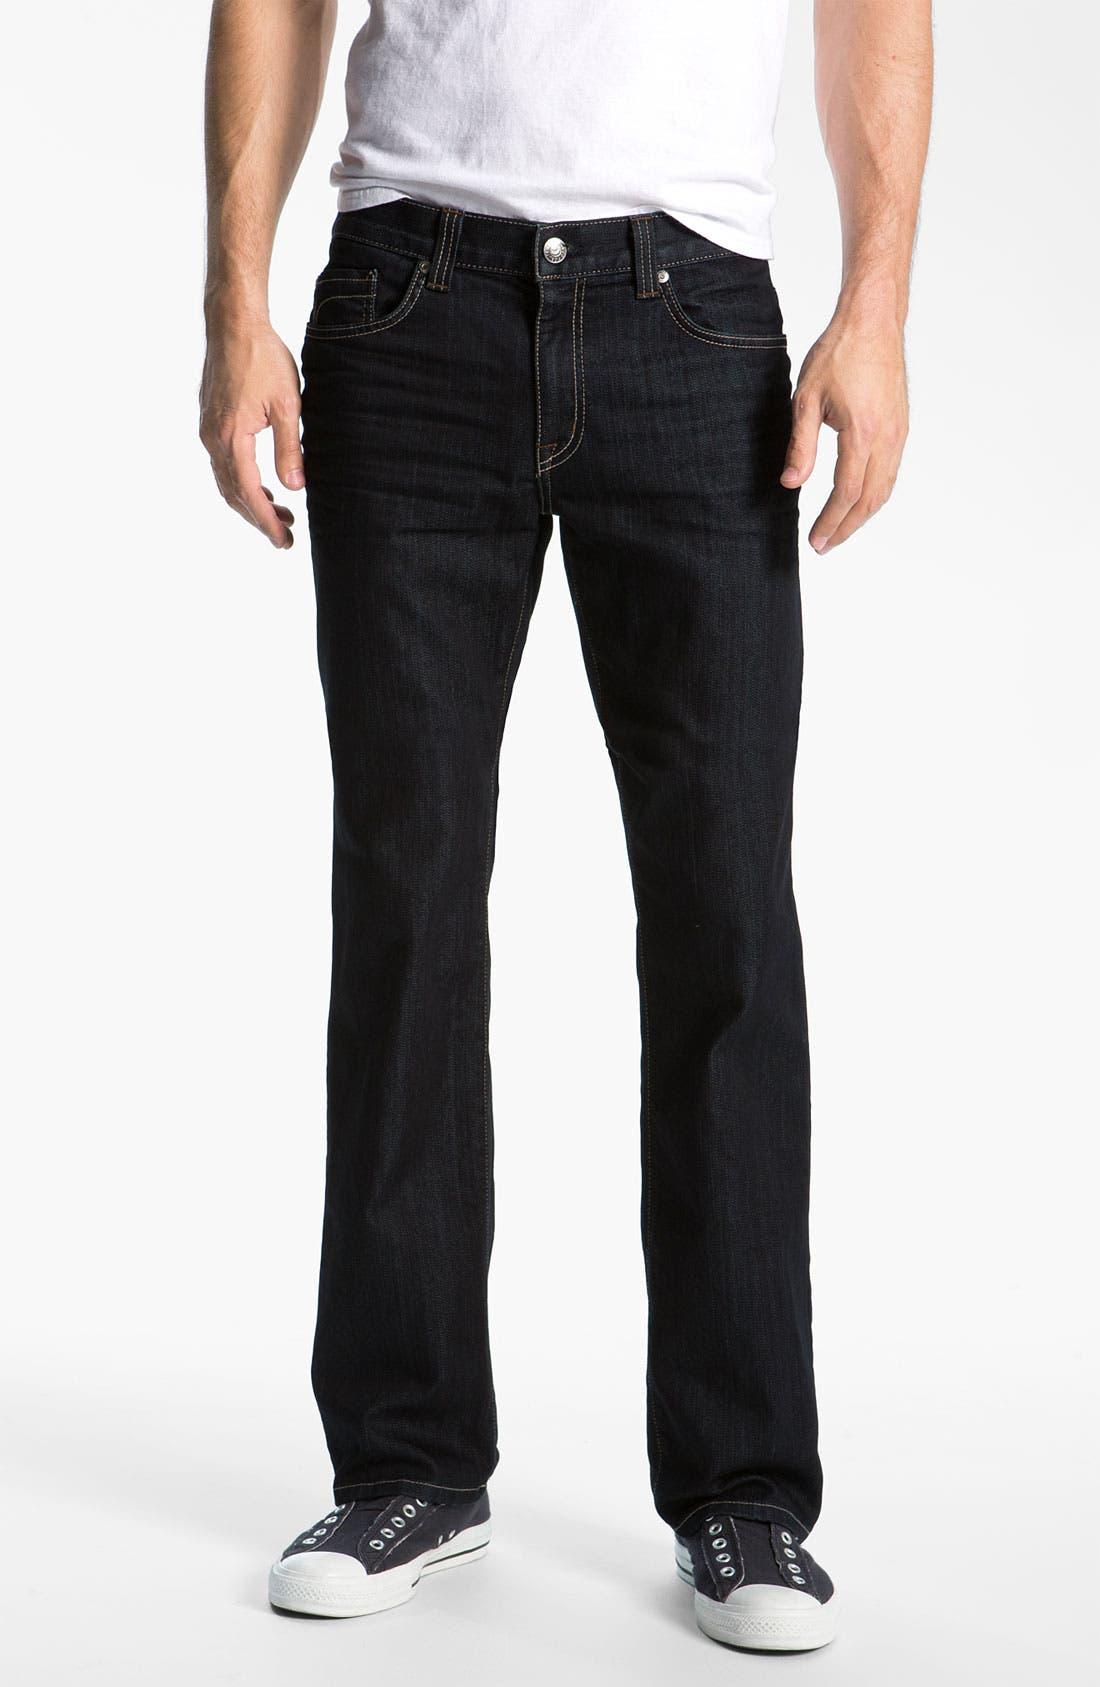 Alternate Image 1 Selected - Fidelity Denim '50-11' Straight Leg Jeans (Sabbath Rinse)